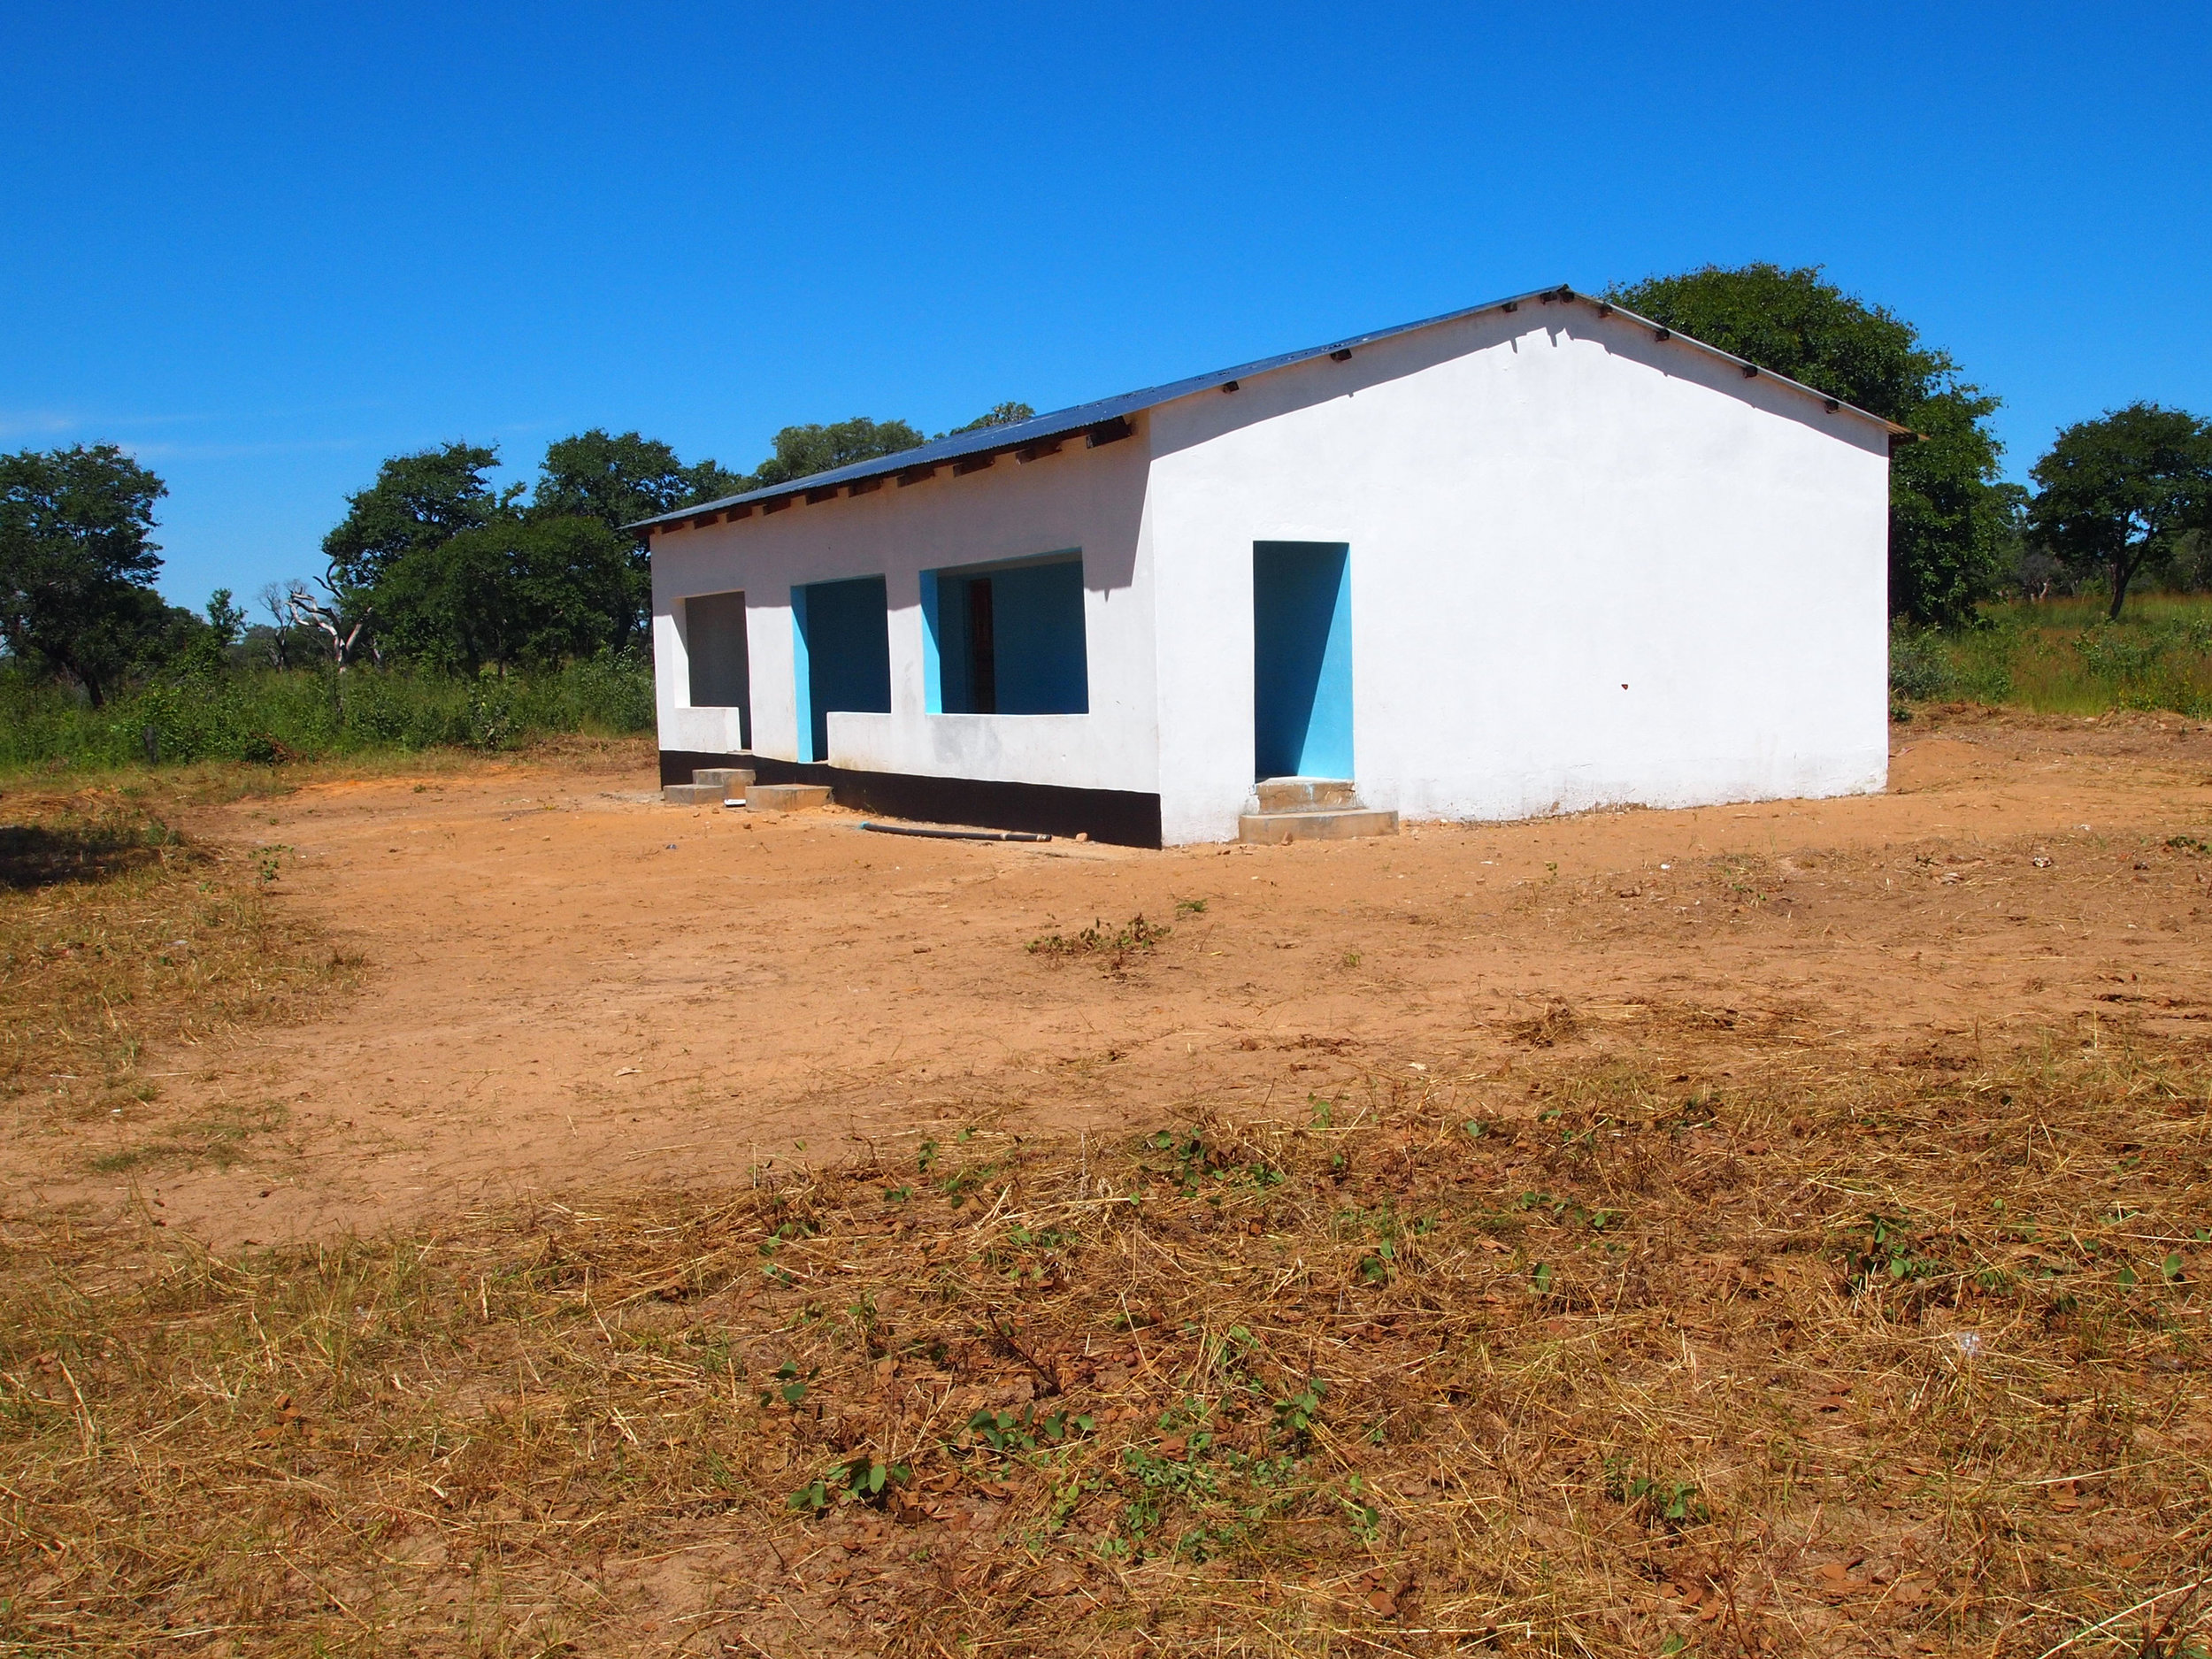 Sankandi outreach clinic